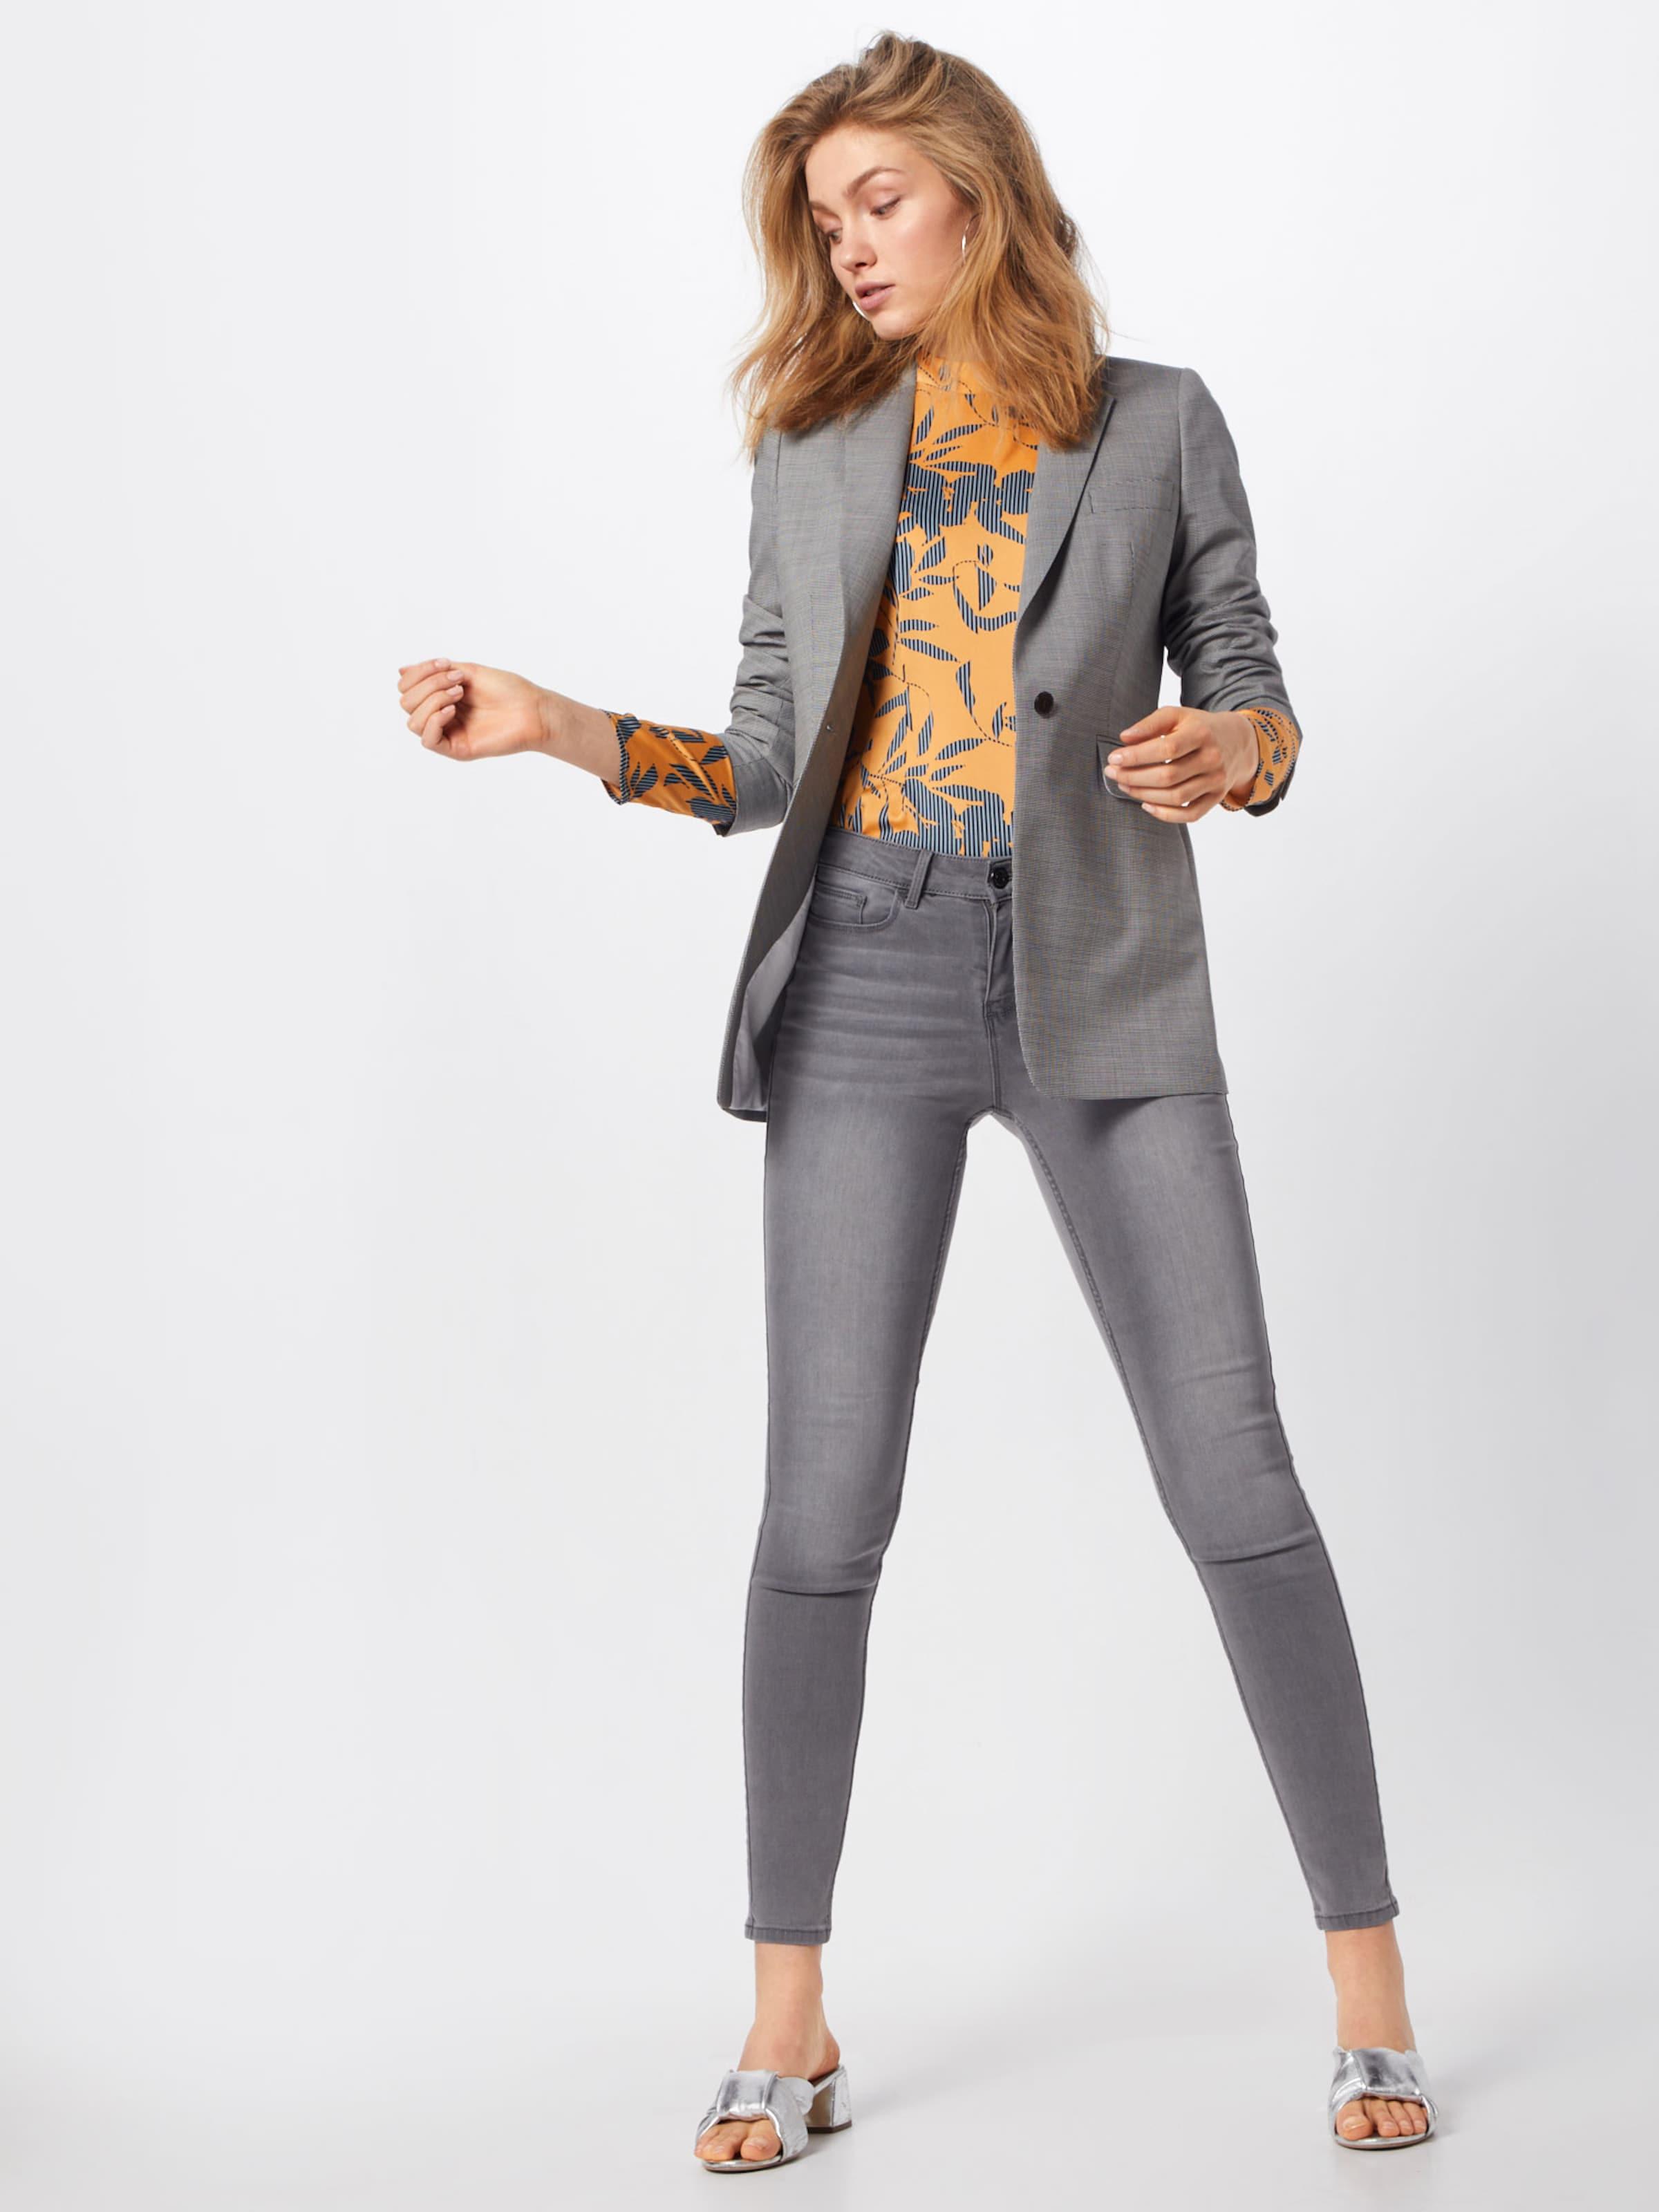 In Jeans Grey Denim Vila 'vicommit Felicia' R5jL4q3A